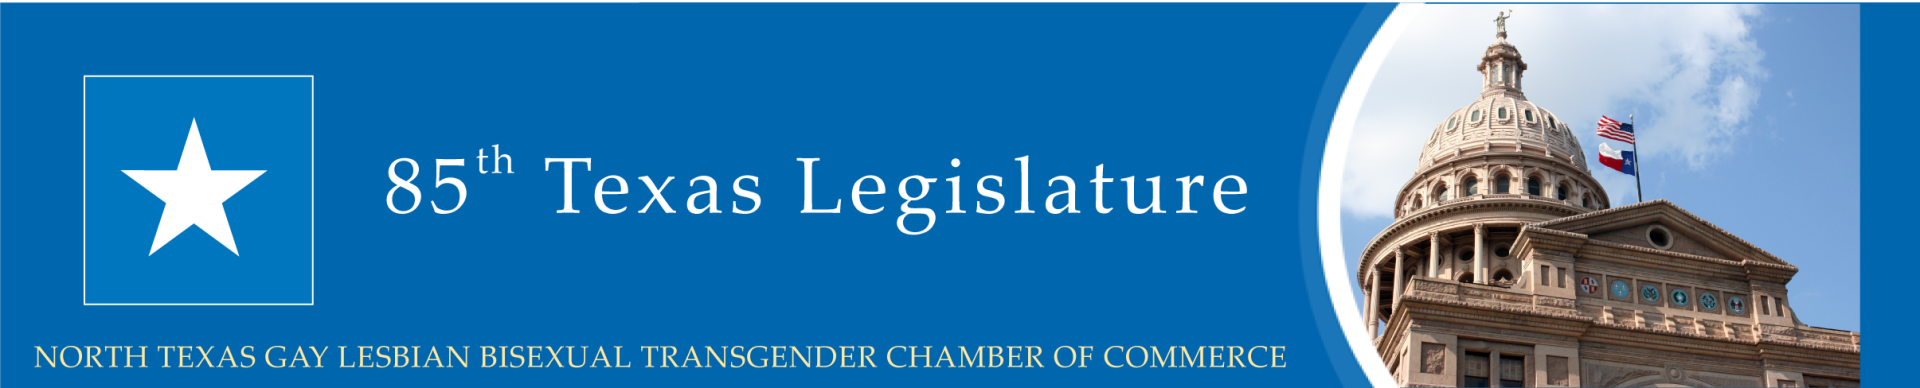 2017-02-85th-Legislature-01-w1920